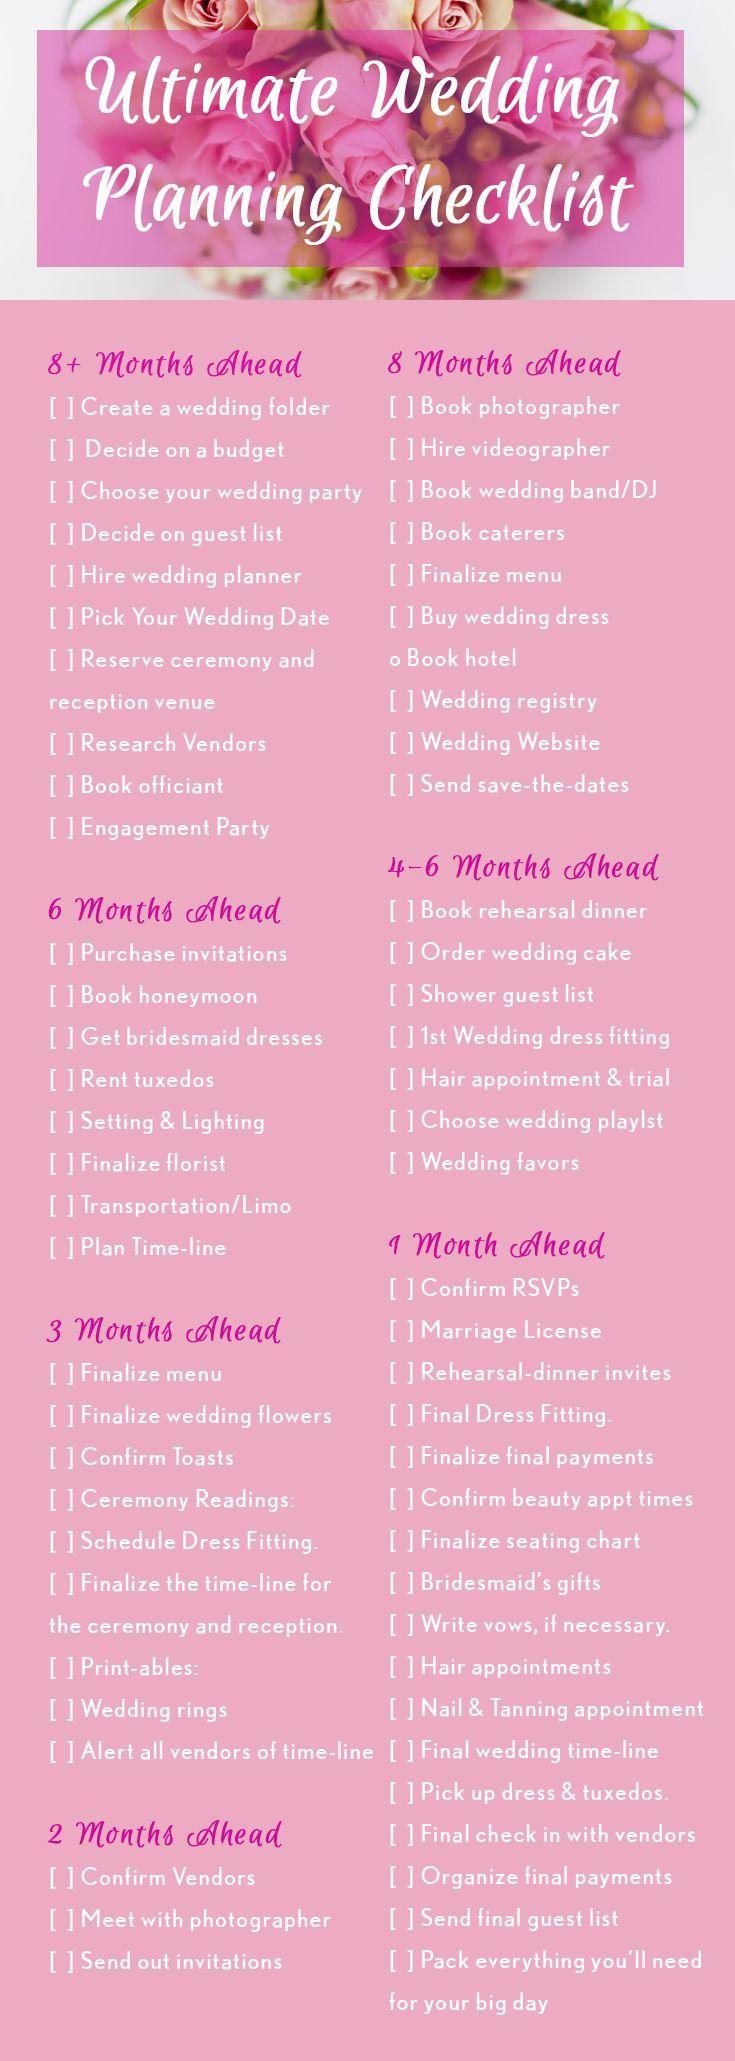 6 month wedding planning timeline